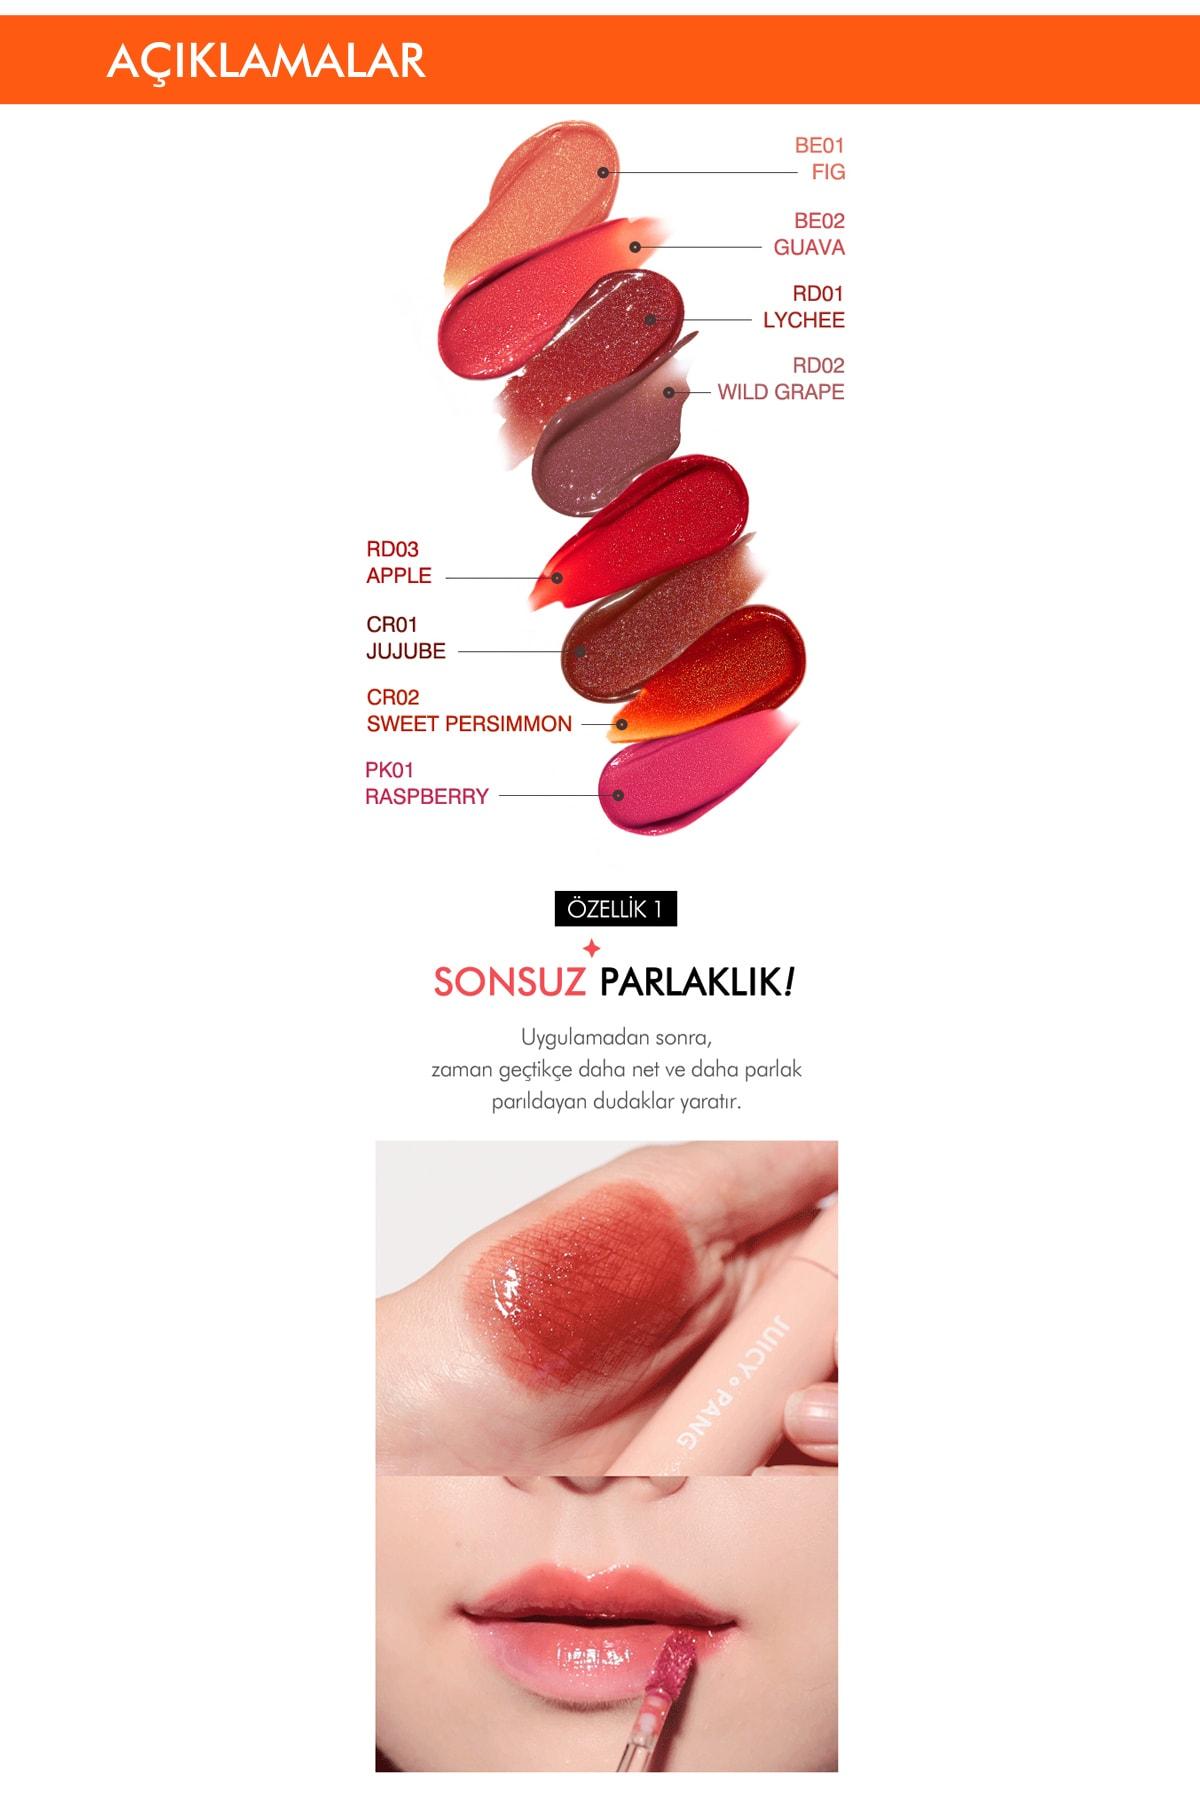 Missha Işıltı&Dolgunluk Veren Parlak Gloss Tint APIEU Juicy-Pang Sparkling Tint RD02 3